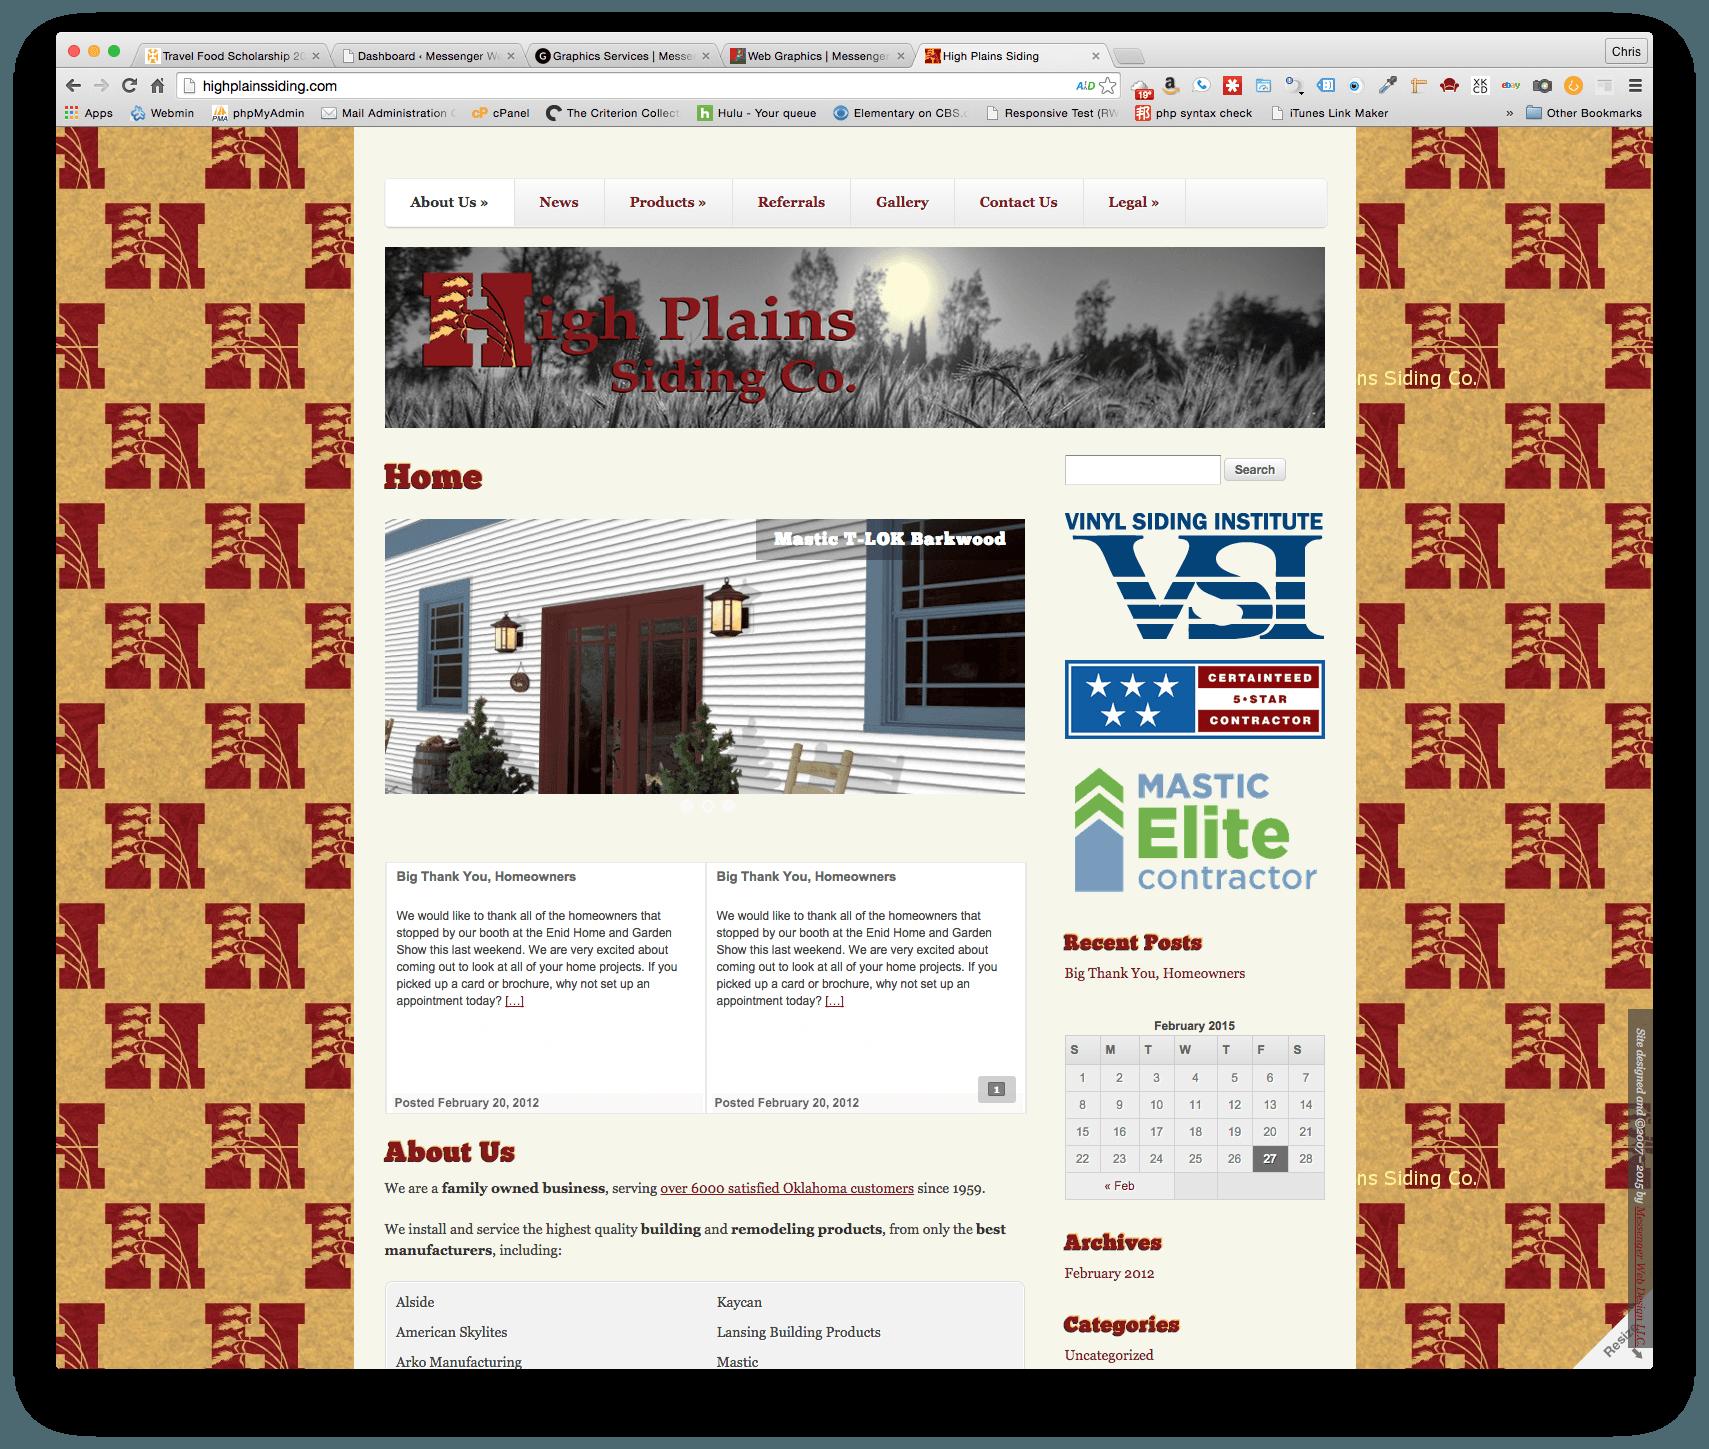 High Plains Siding Co. Homepage